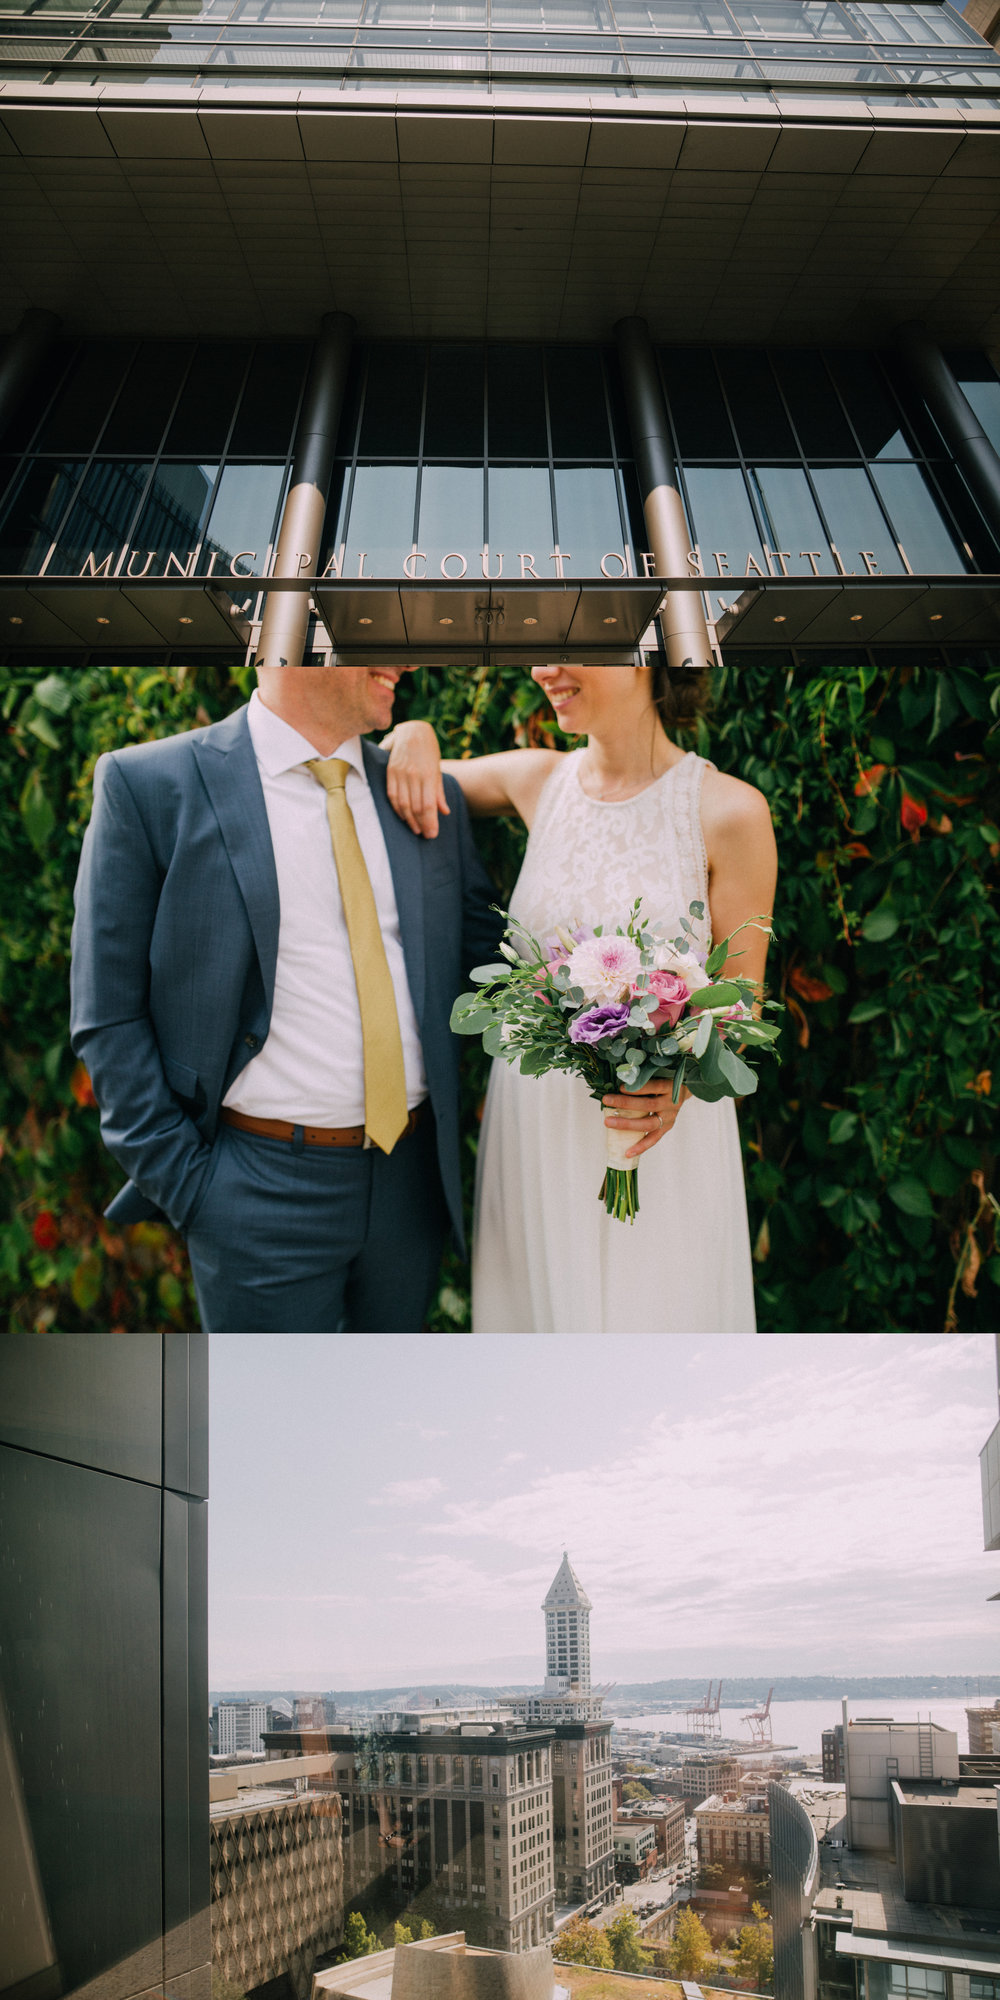 seattle courthouse wedding photographer elopement washington state-1.jpg